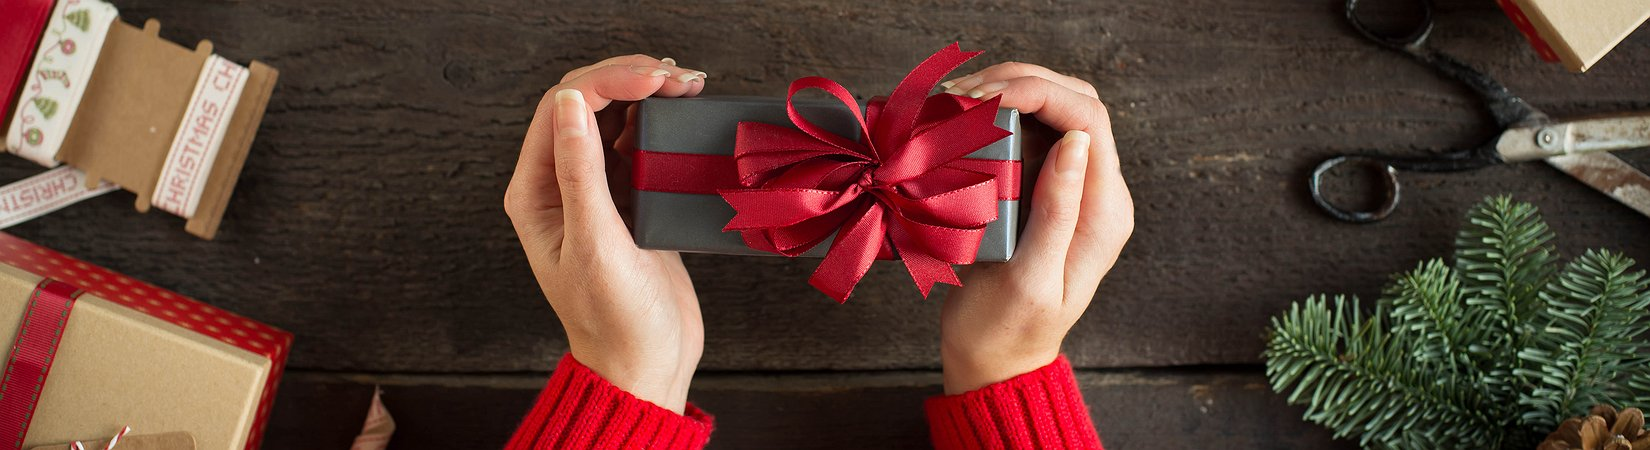 Amazon vendeu mil milhões de produtos este Natal